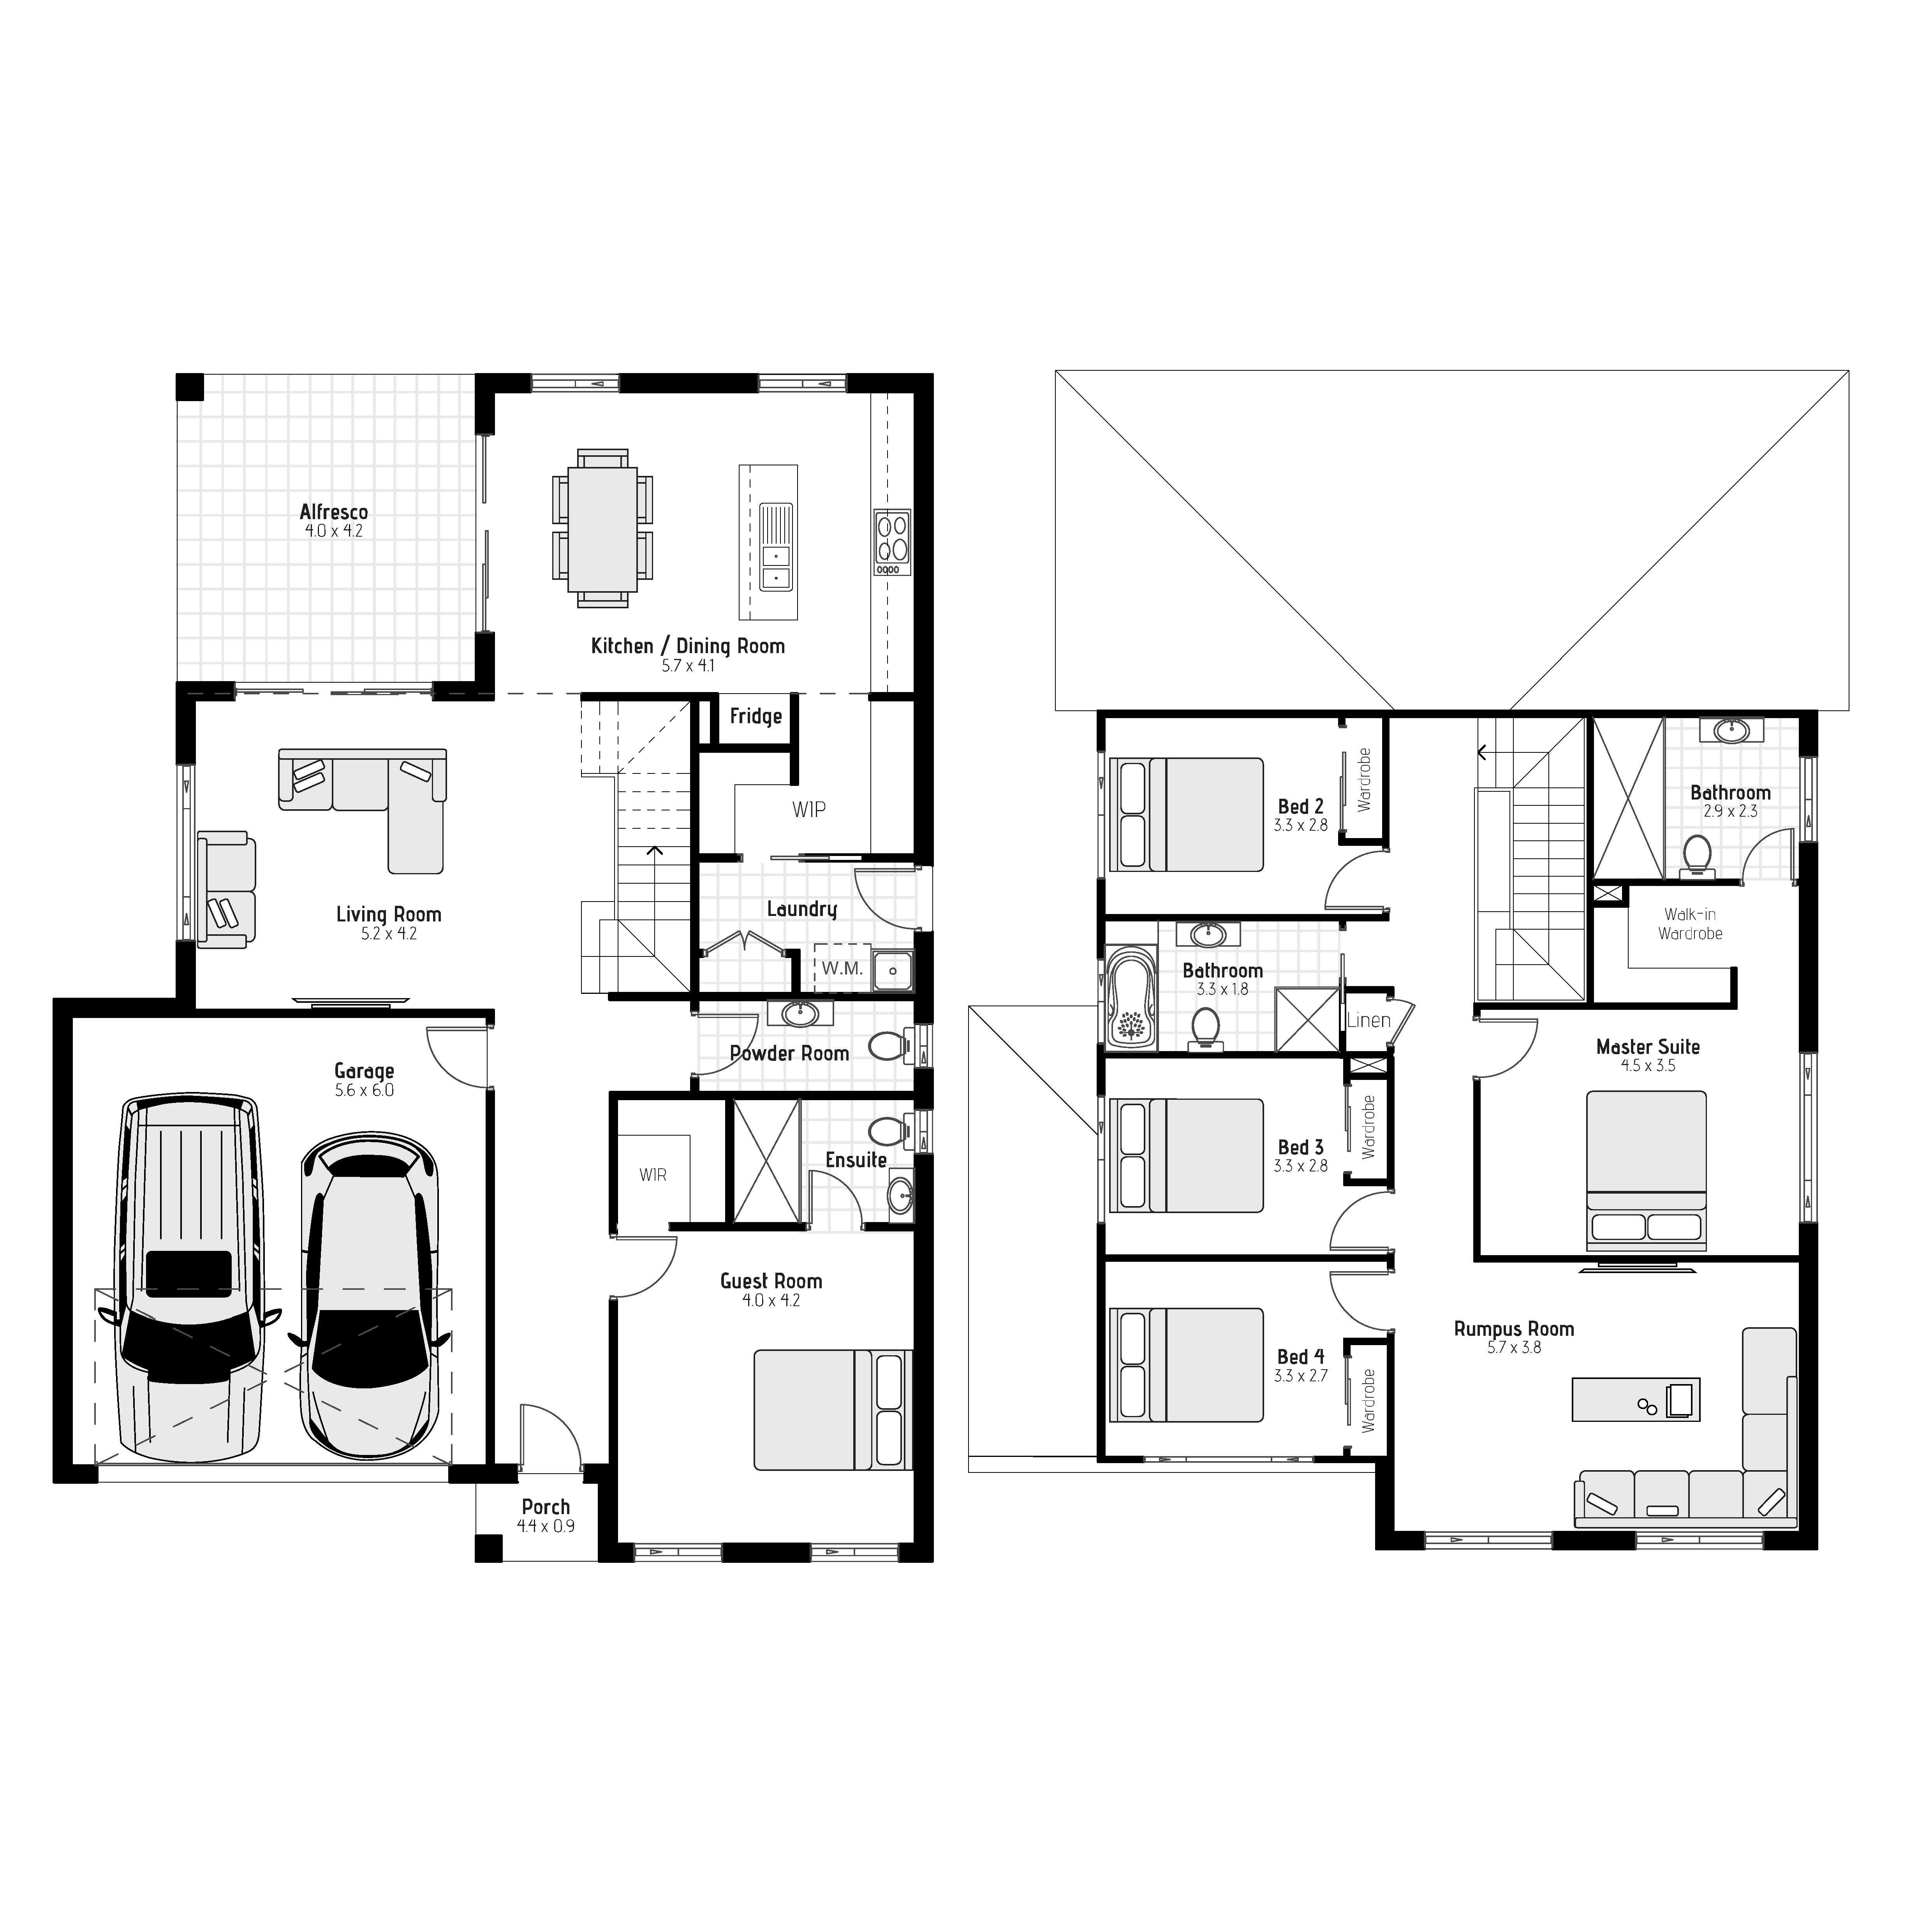 Avon MKI Floorplan